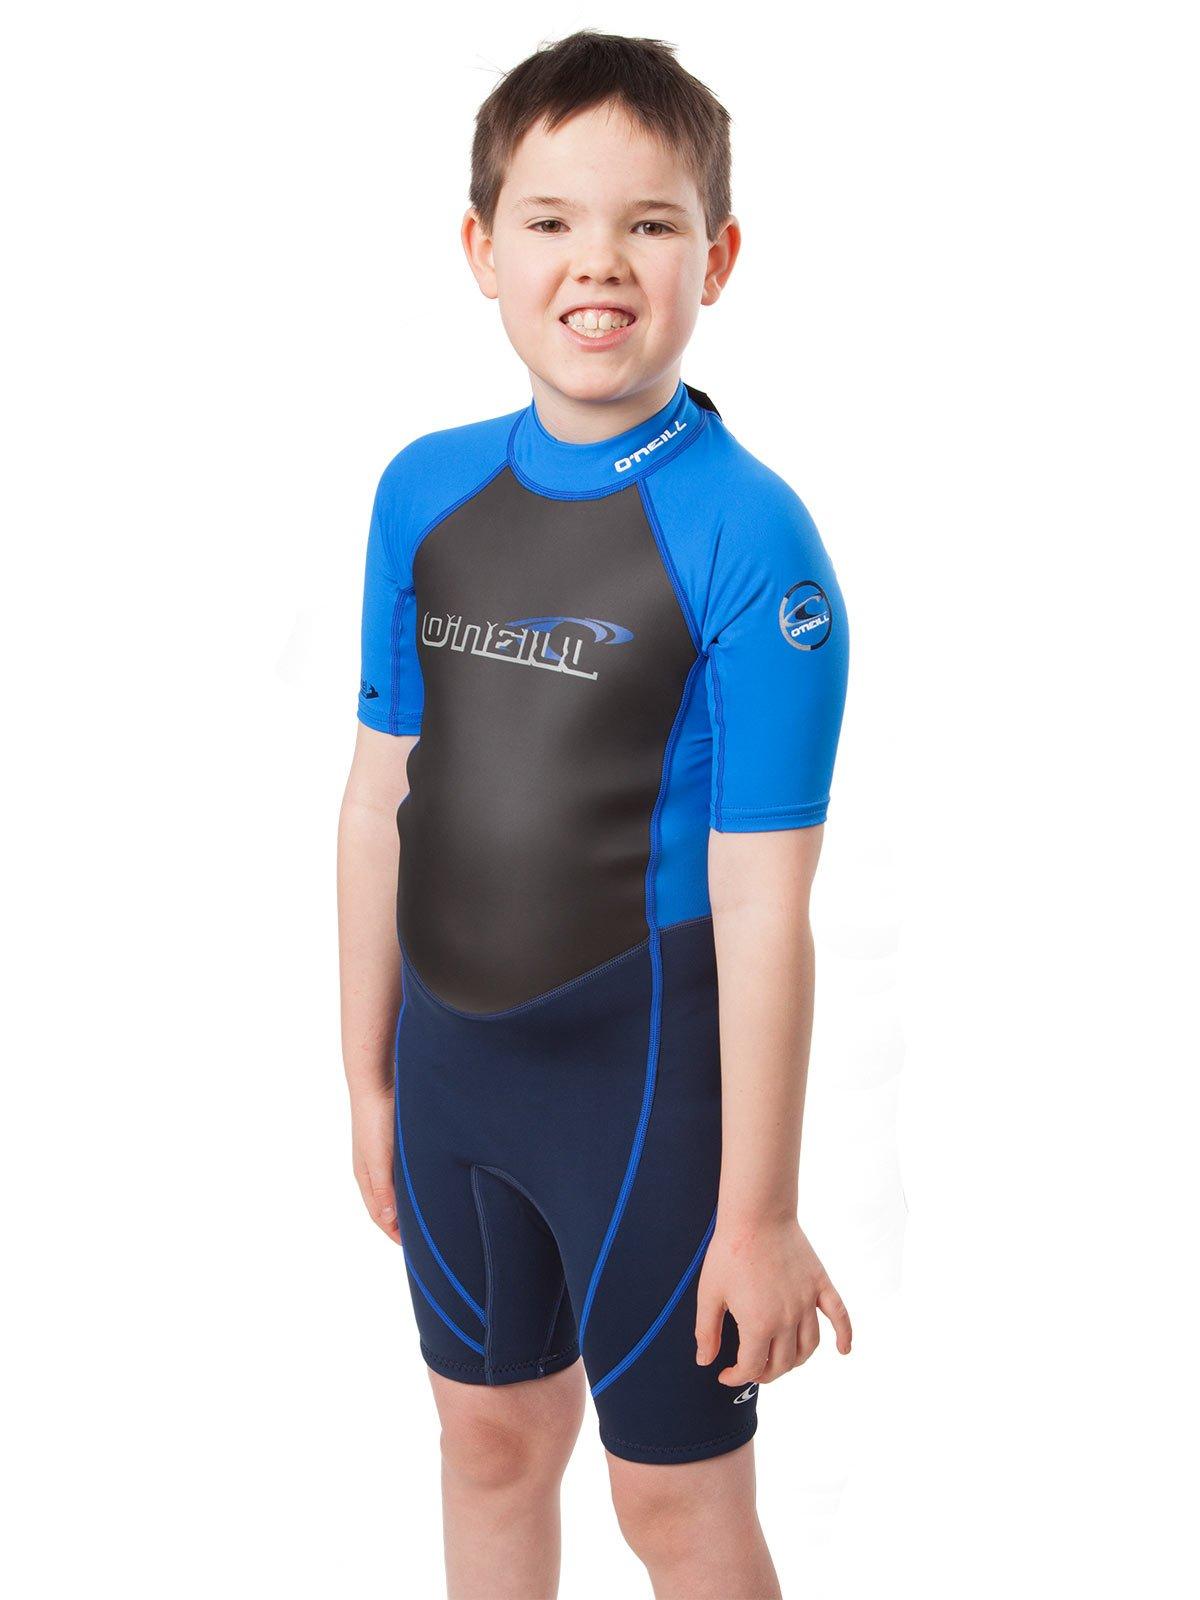 O'Neill Reactor Hybrid Kids Shorty Wetsuit 10 Navy/Ocean Blue